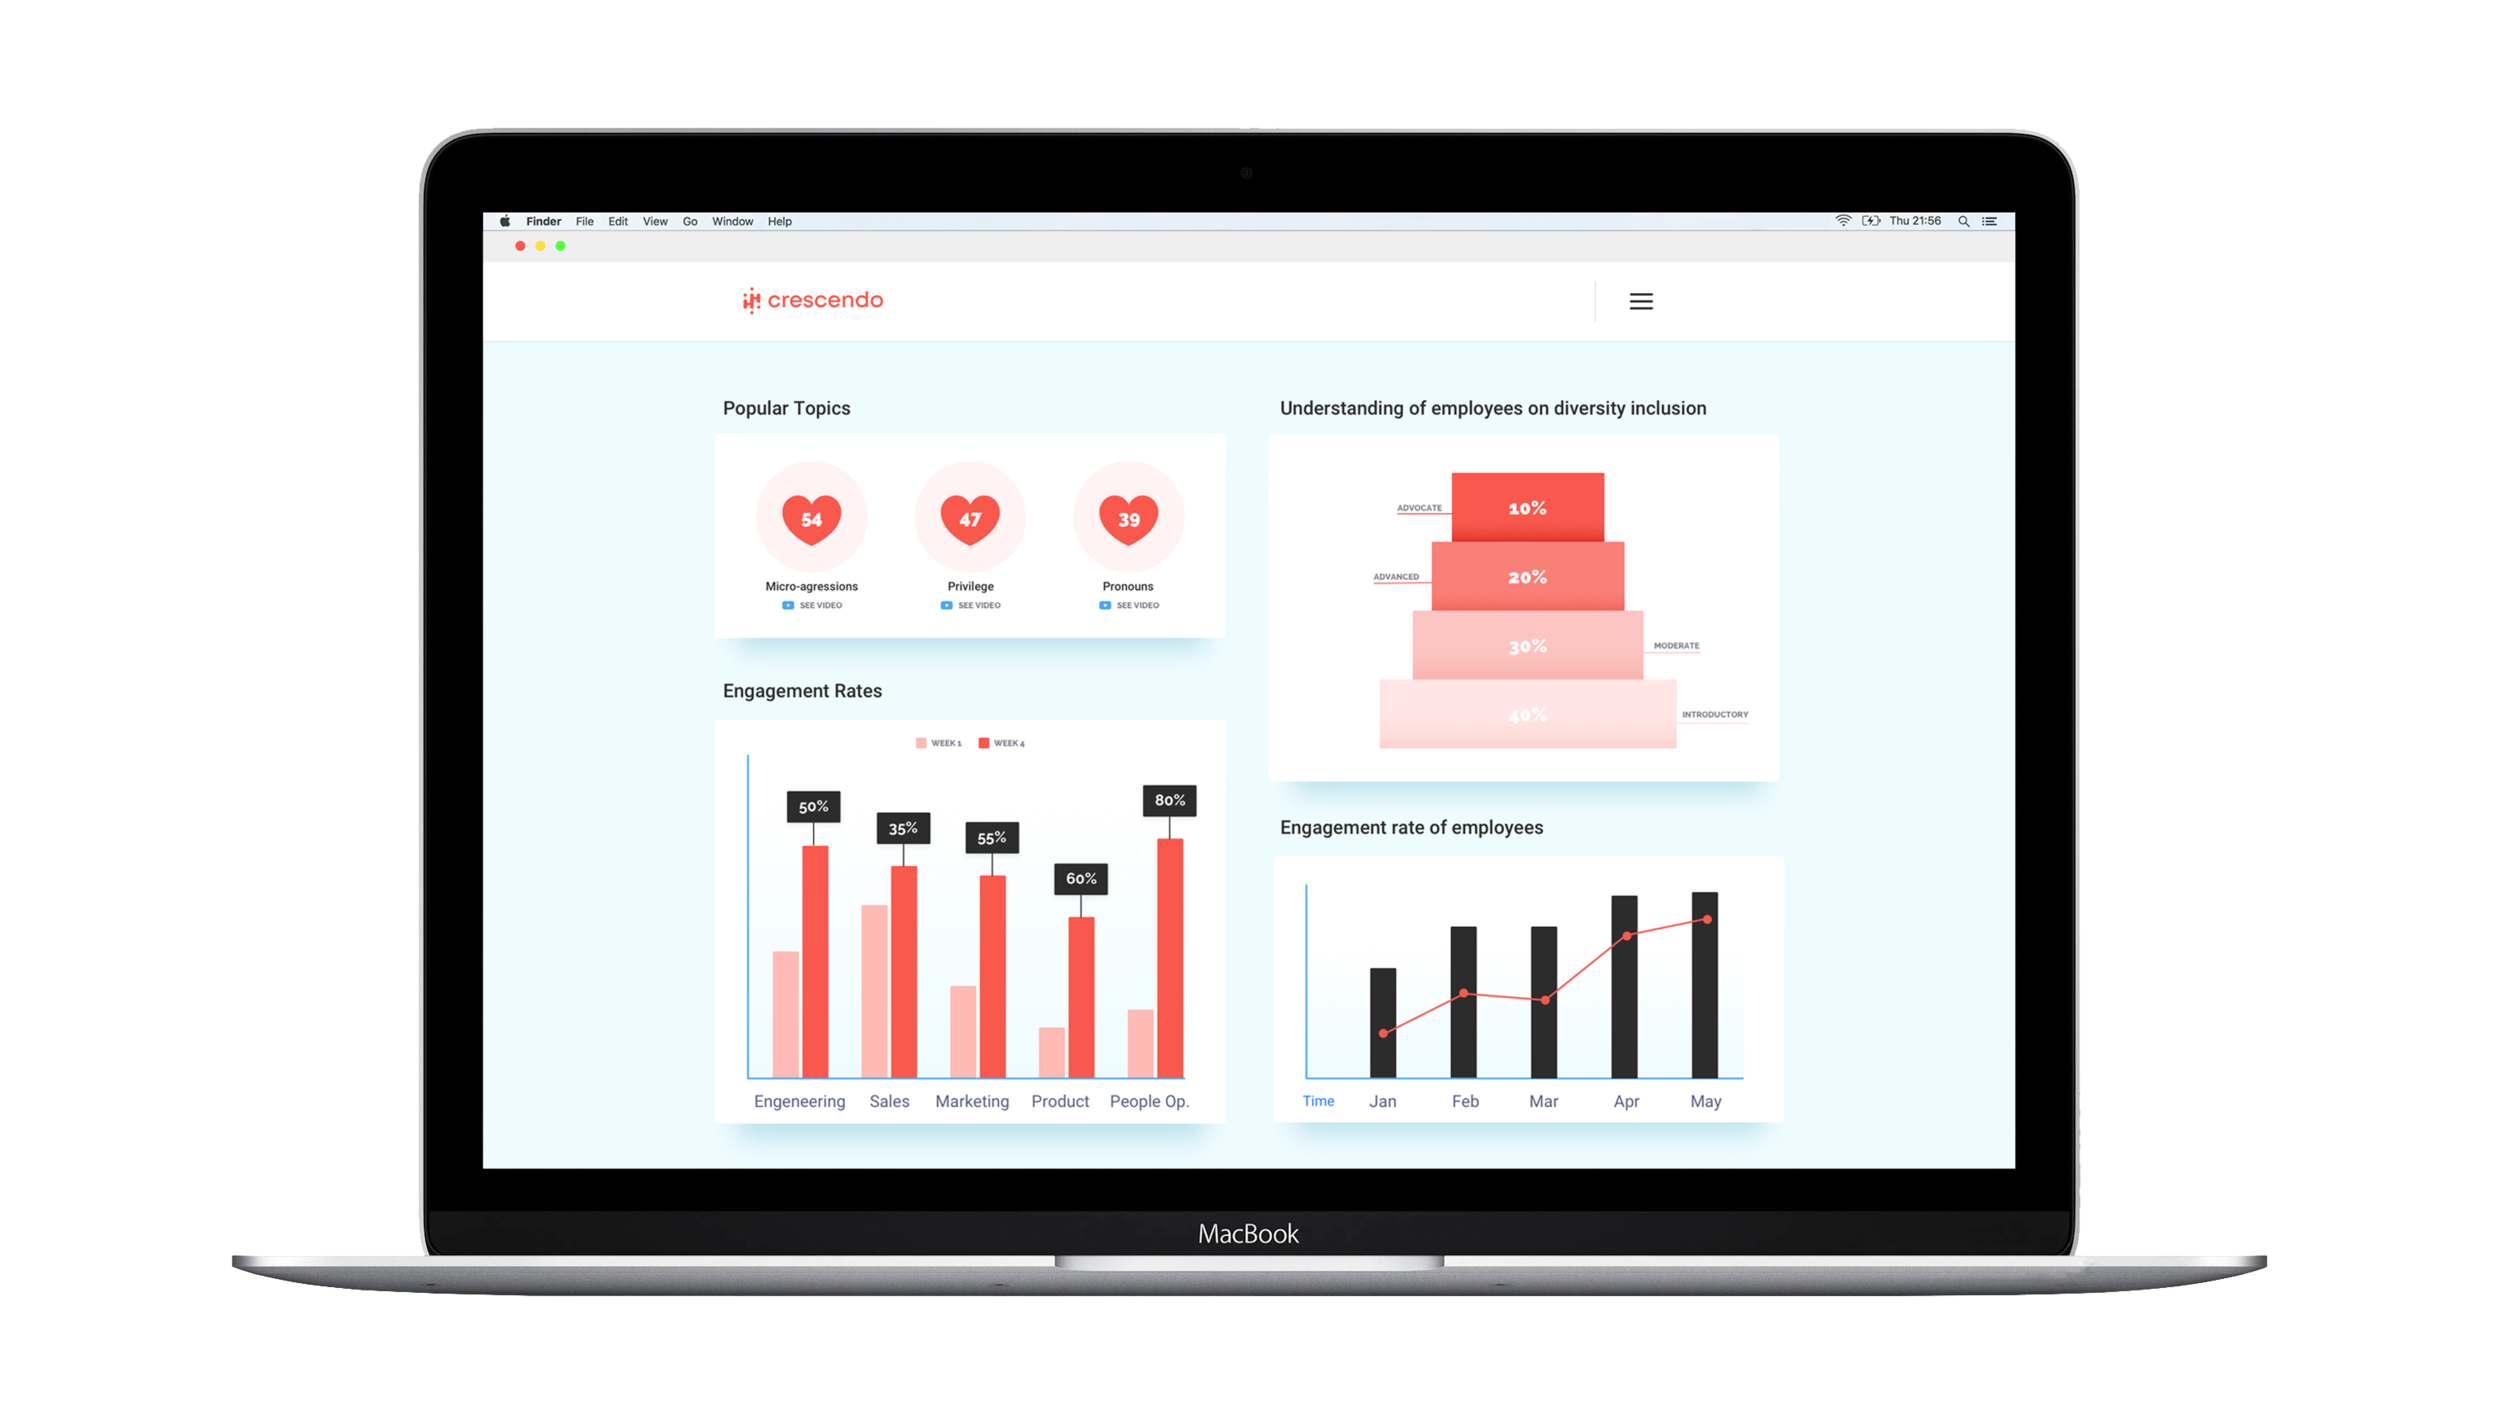 analytics-dashboard-laptop.png